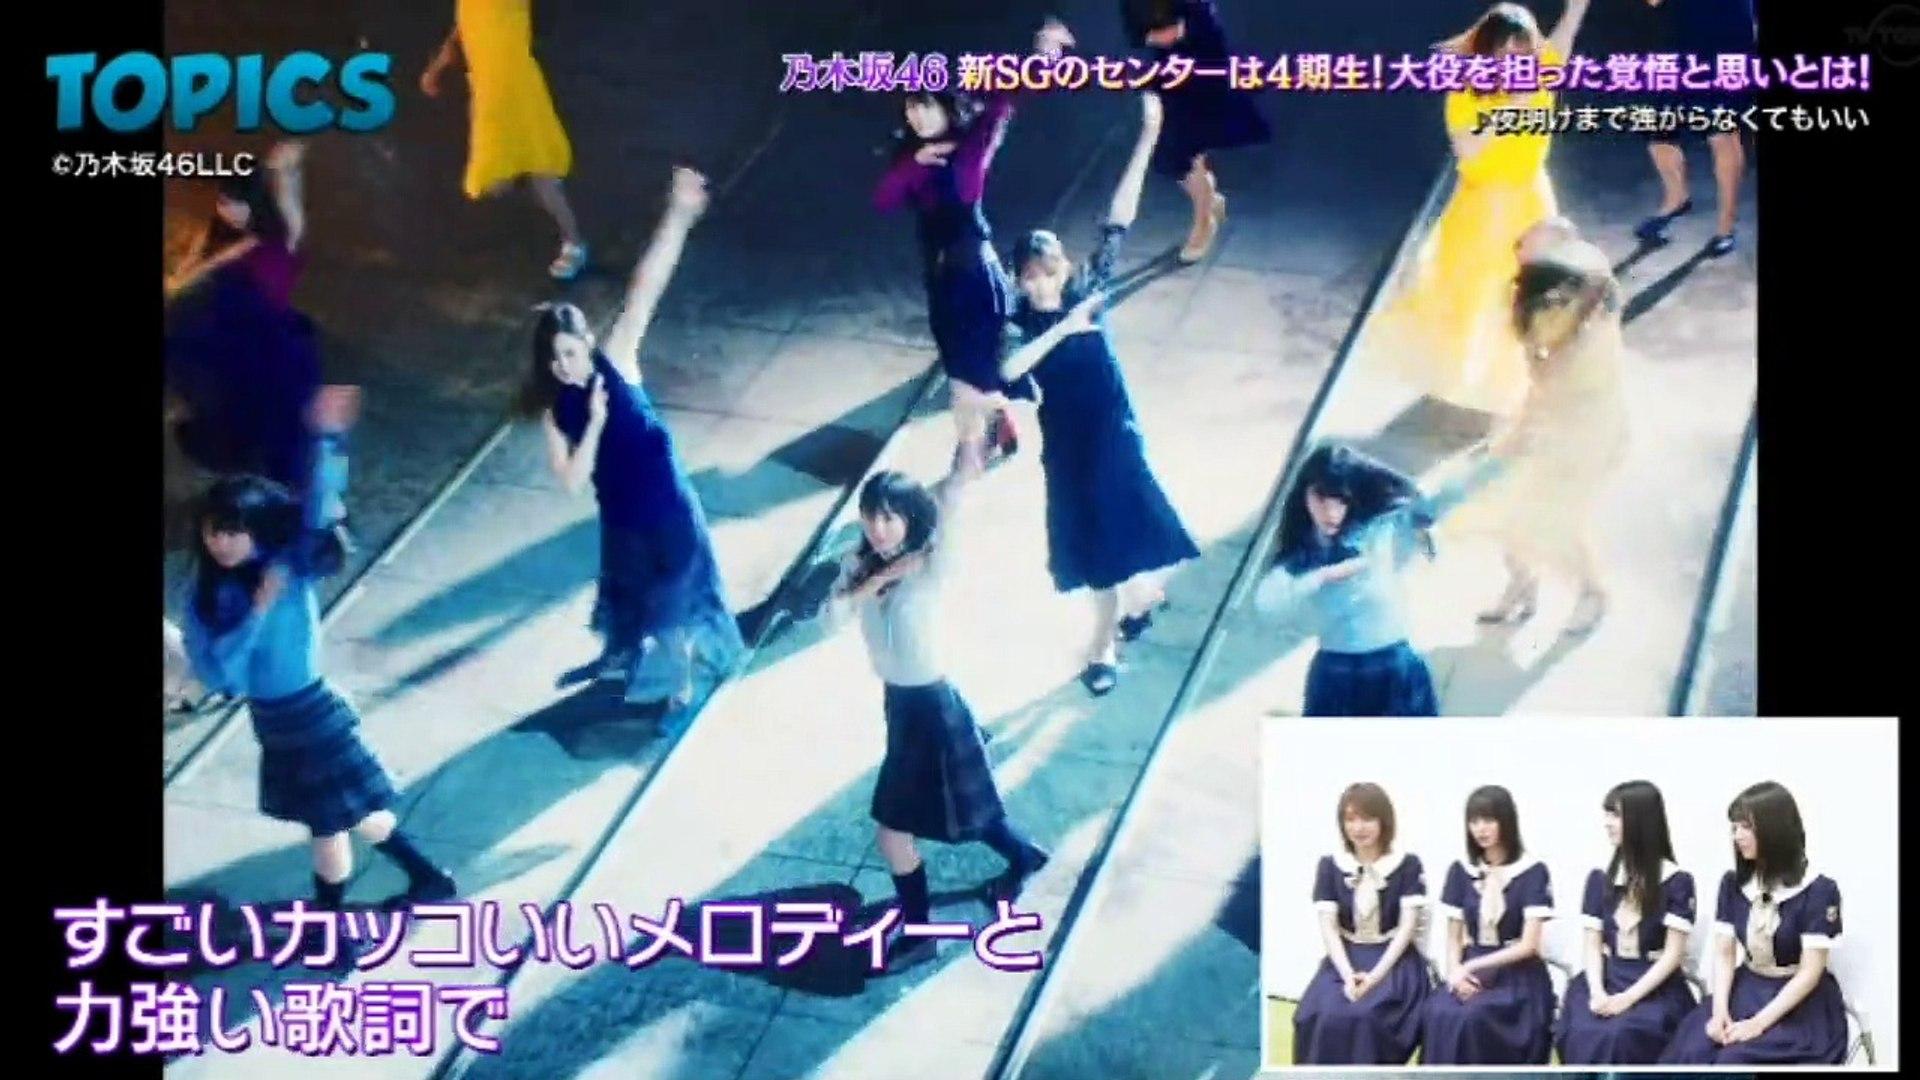 乃木坂46 Cdtv 2019 09 01 動画 Dailymotion